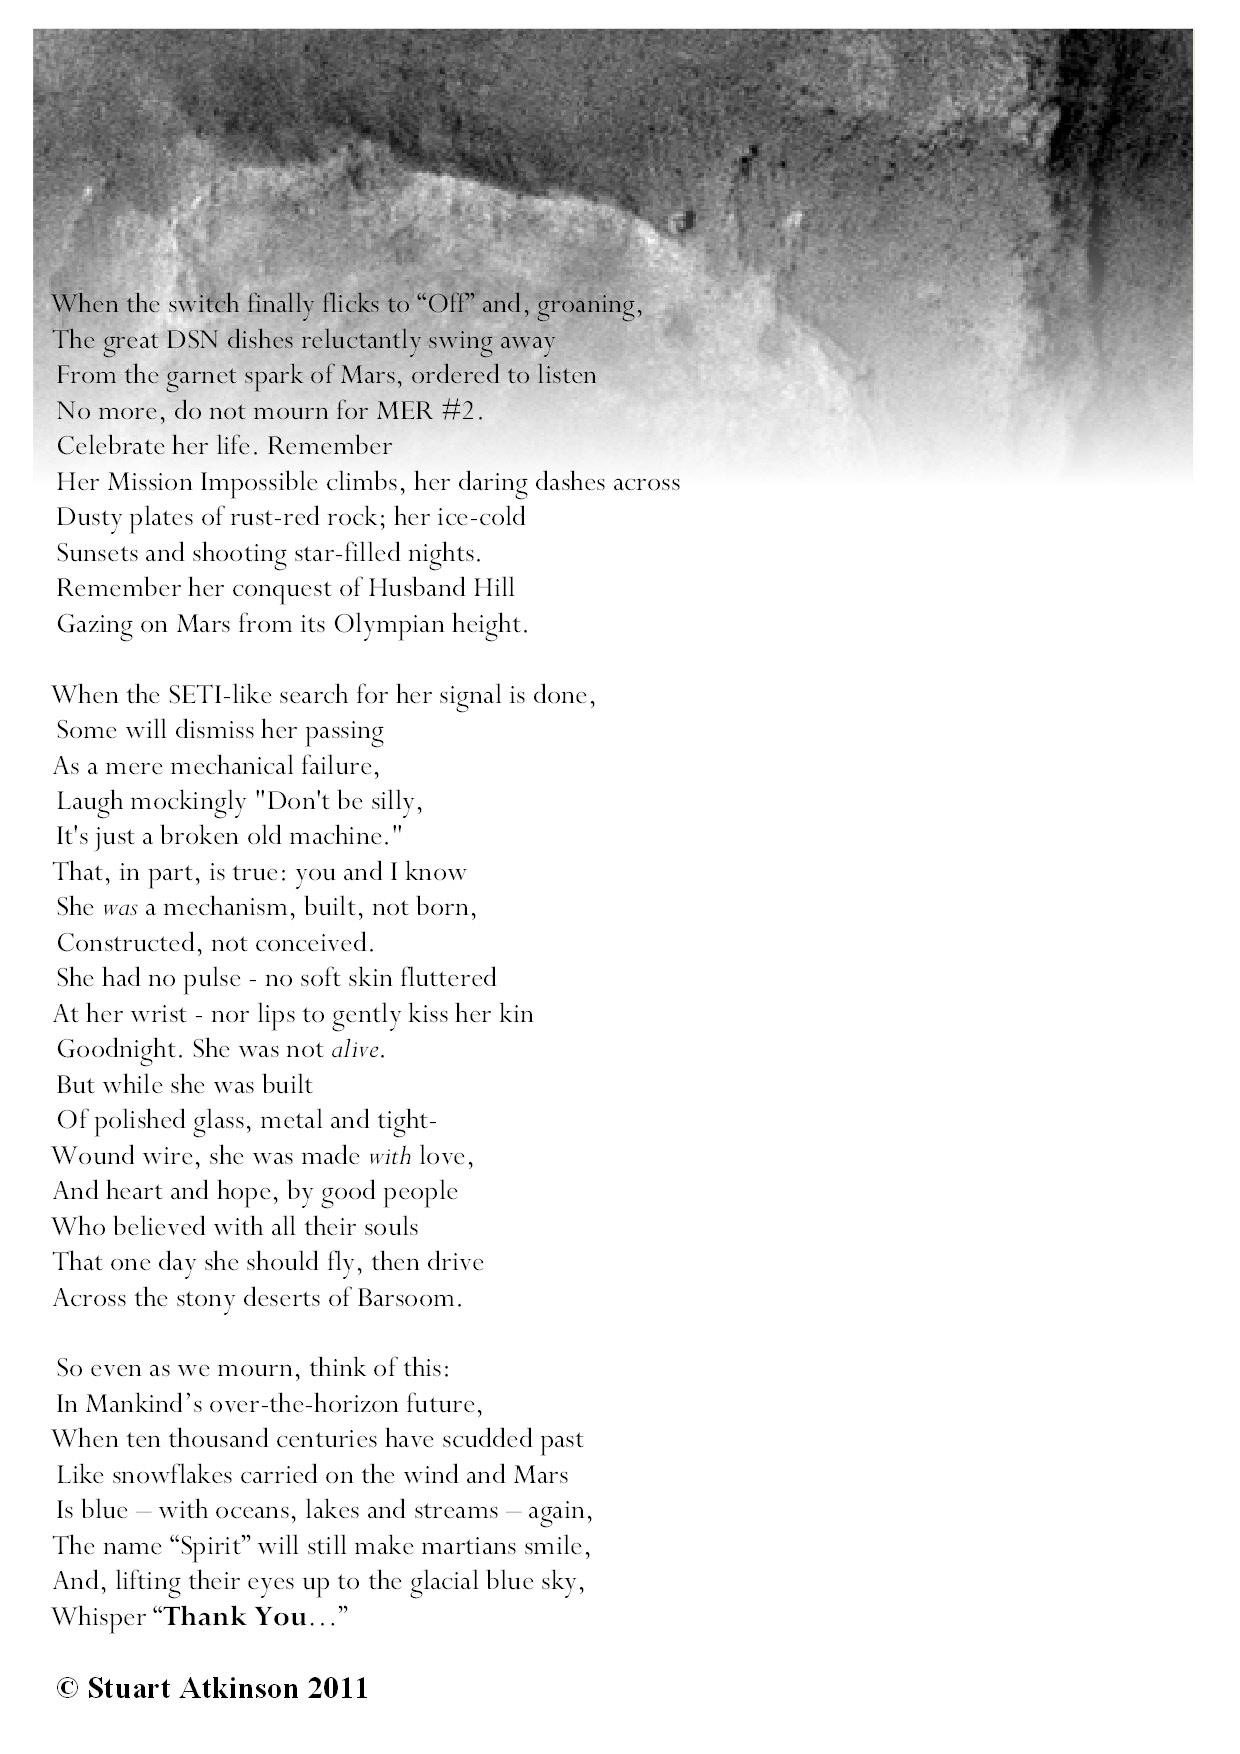 1695 in poetry